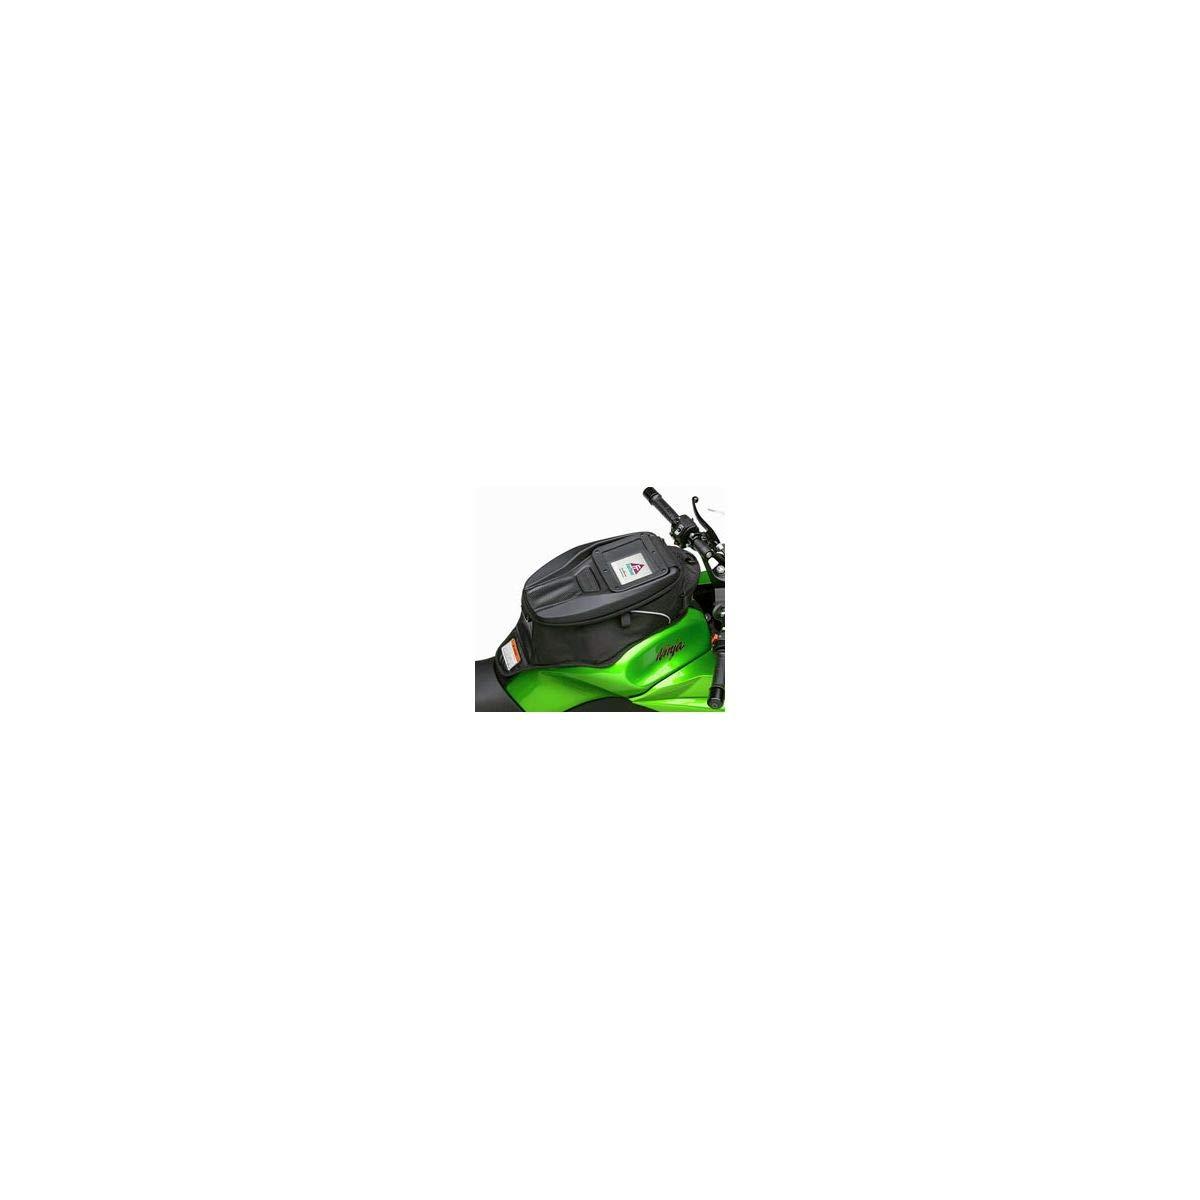 Amazon.com: 11 – 14 Kawasaki Ninja 1000, color negro Tanque ...